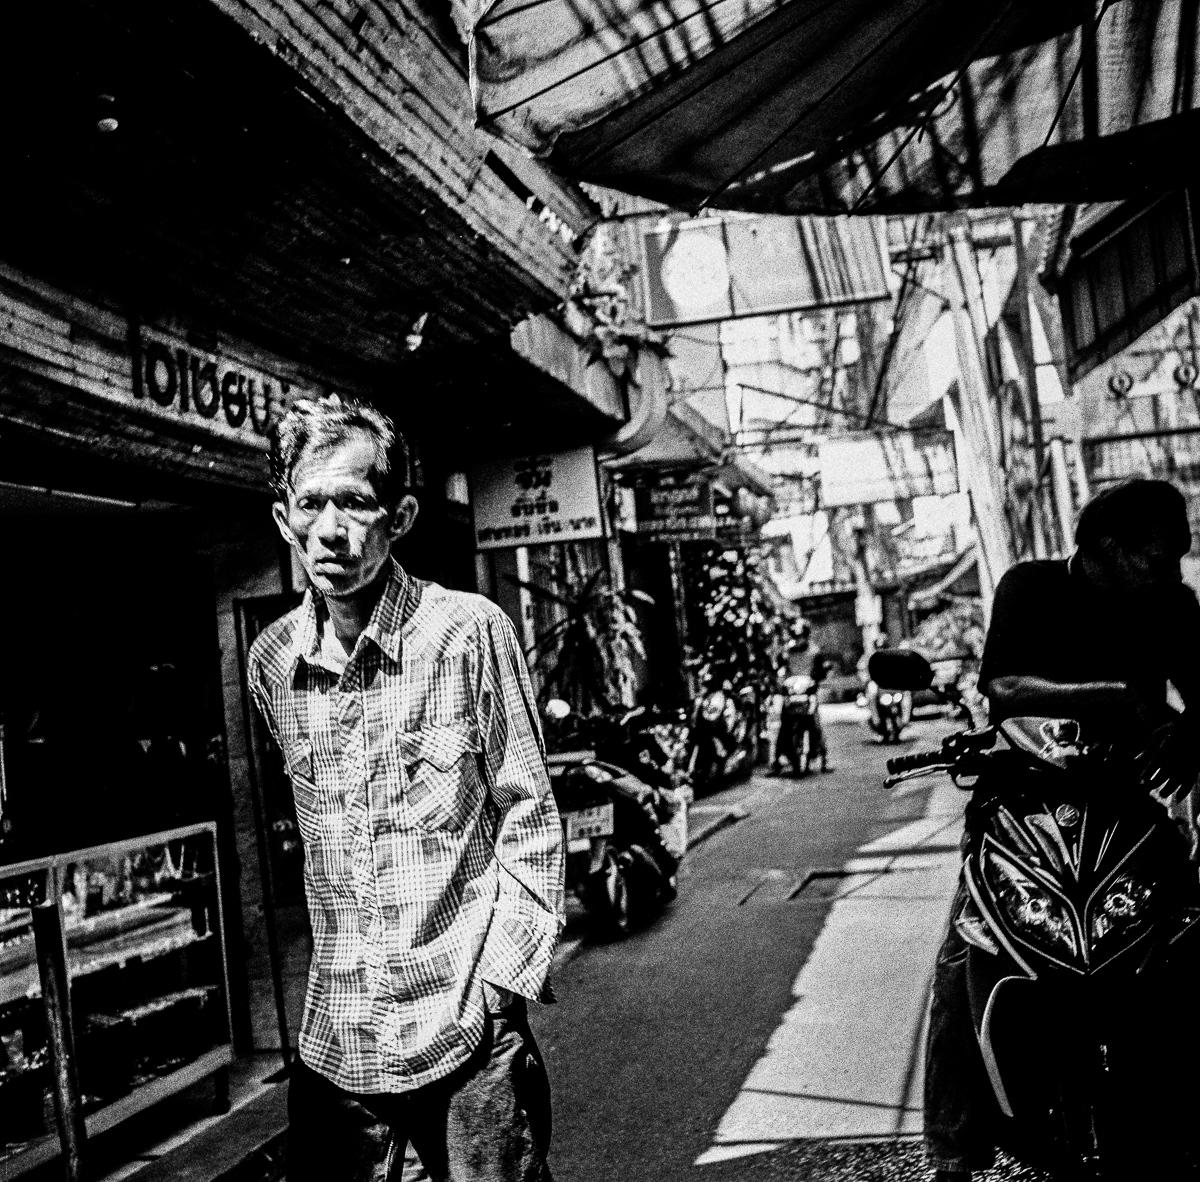 Art and Documentary Photography - Loading Diaconu_14.jpg